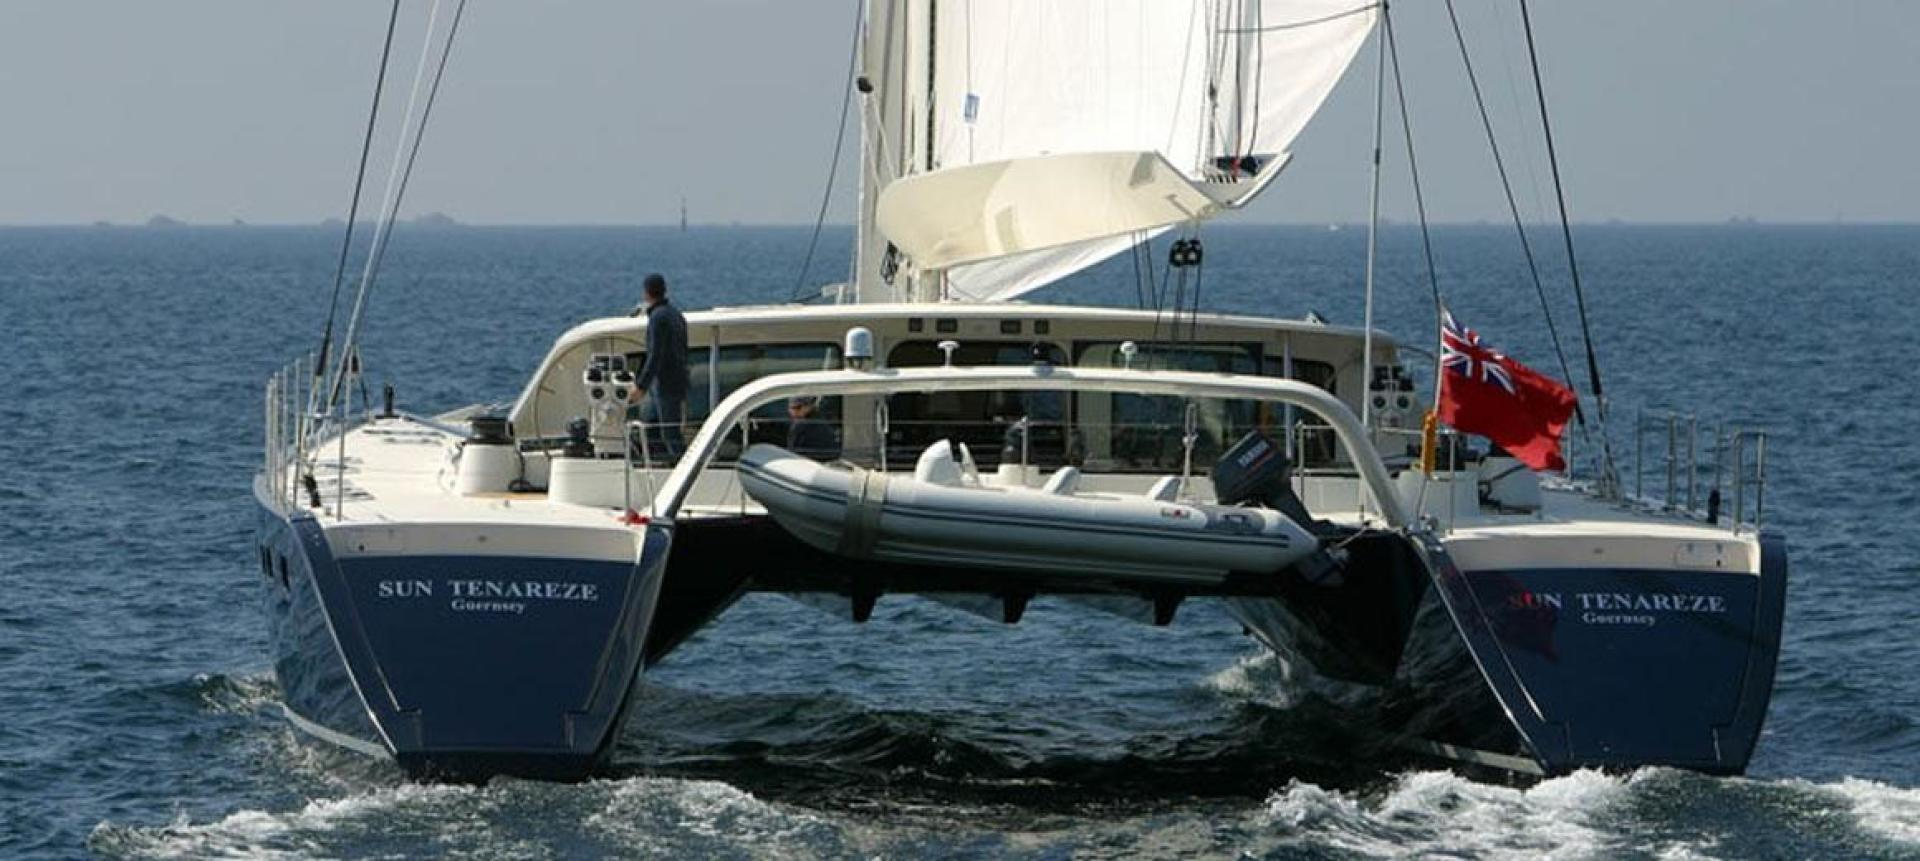 JFA-Catamaran 2004-Azizam Miami-Florida-United States-1367449 | Thumbnail